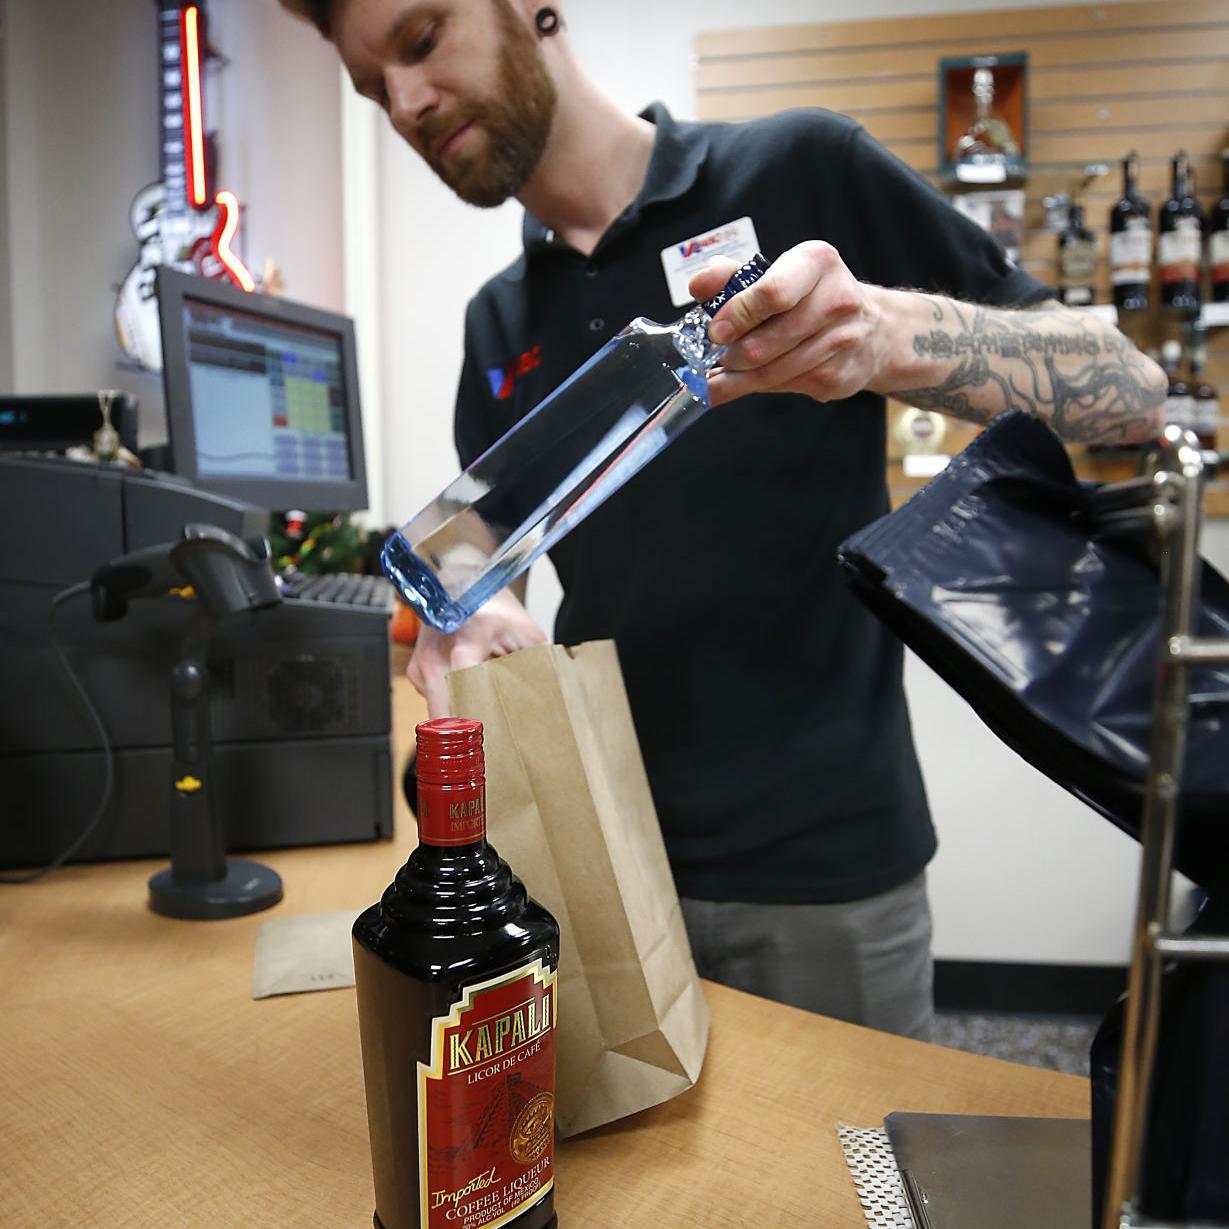 Senate Panel Backs Bill To Let State Liquor Stores Open